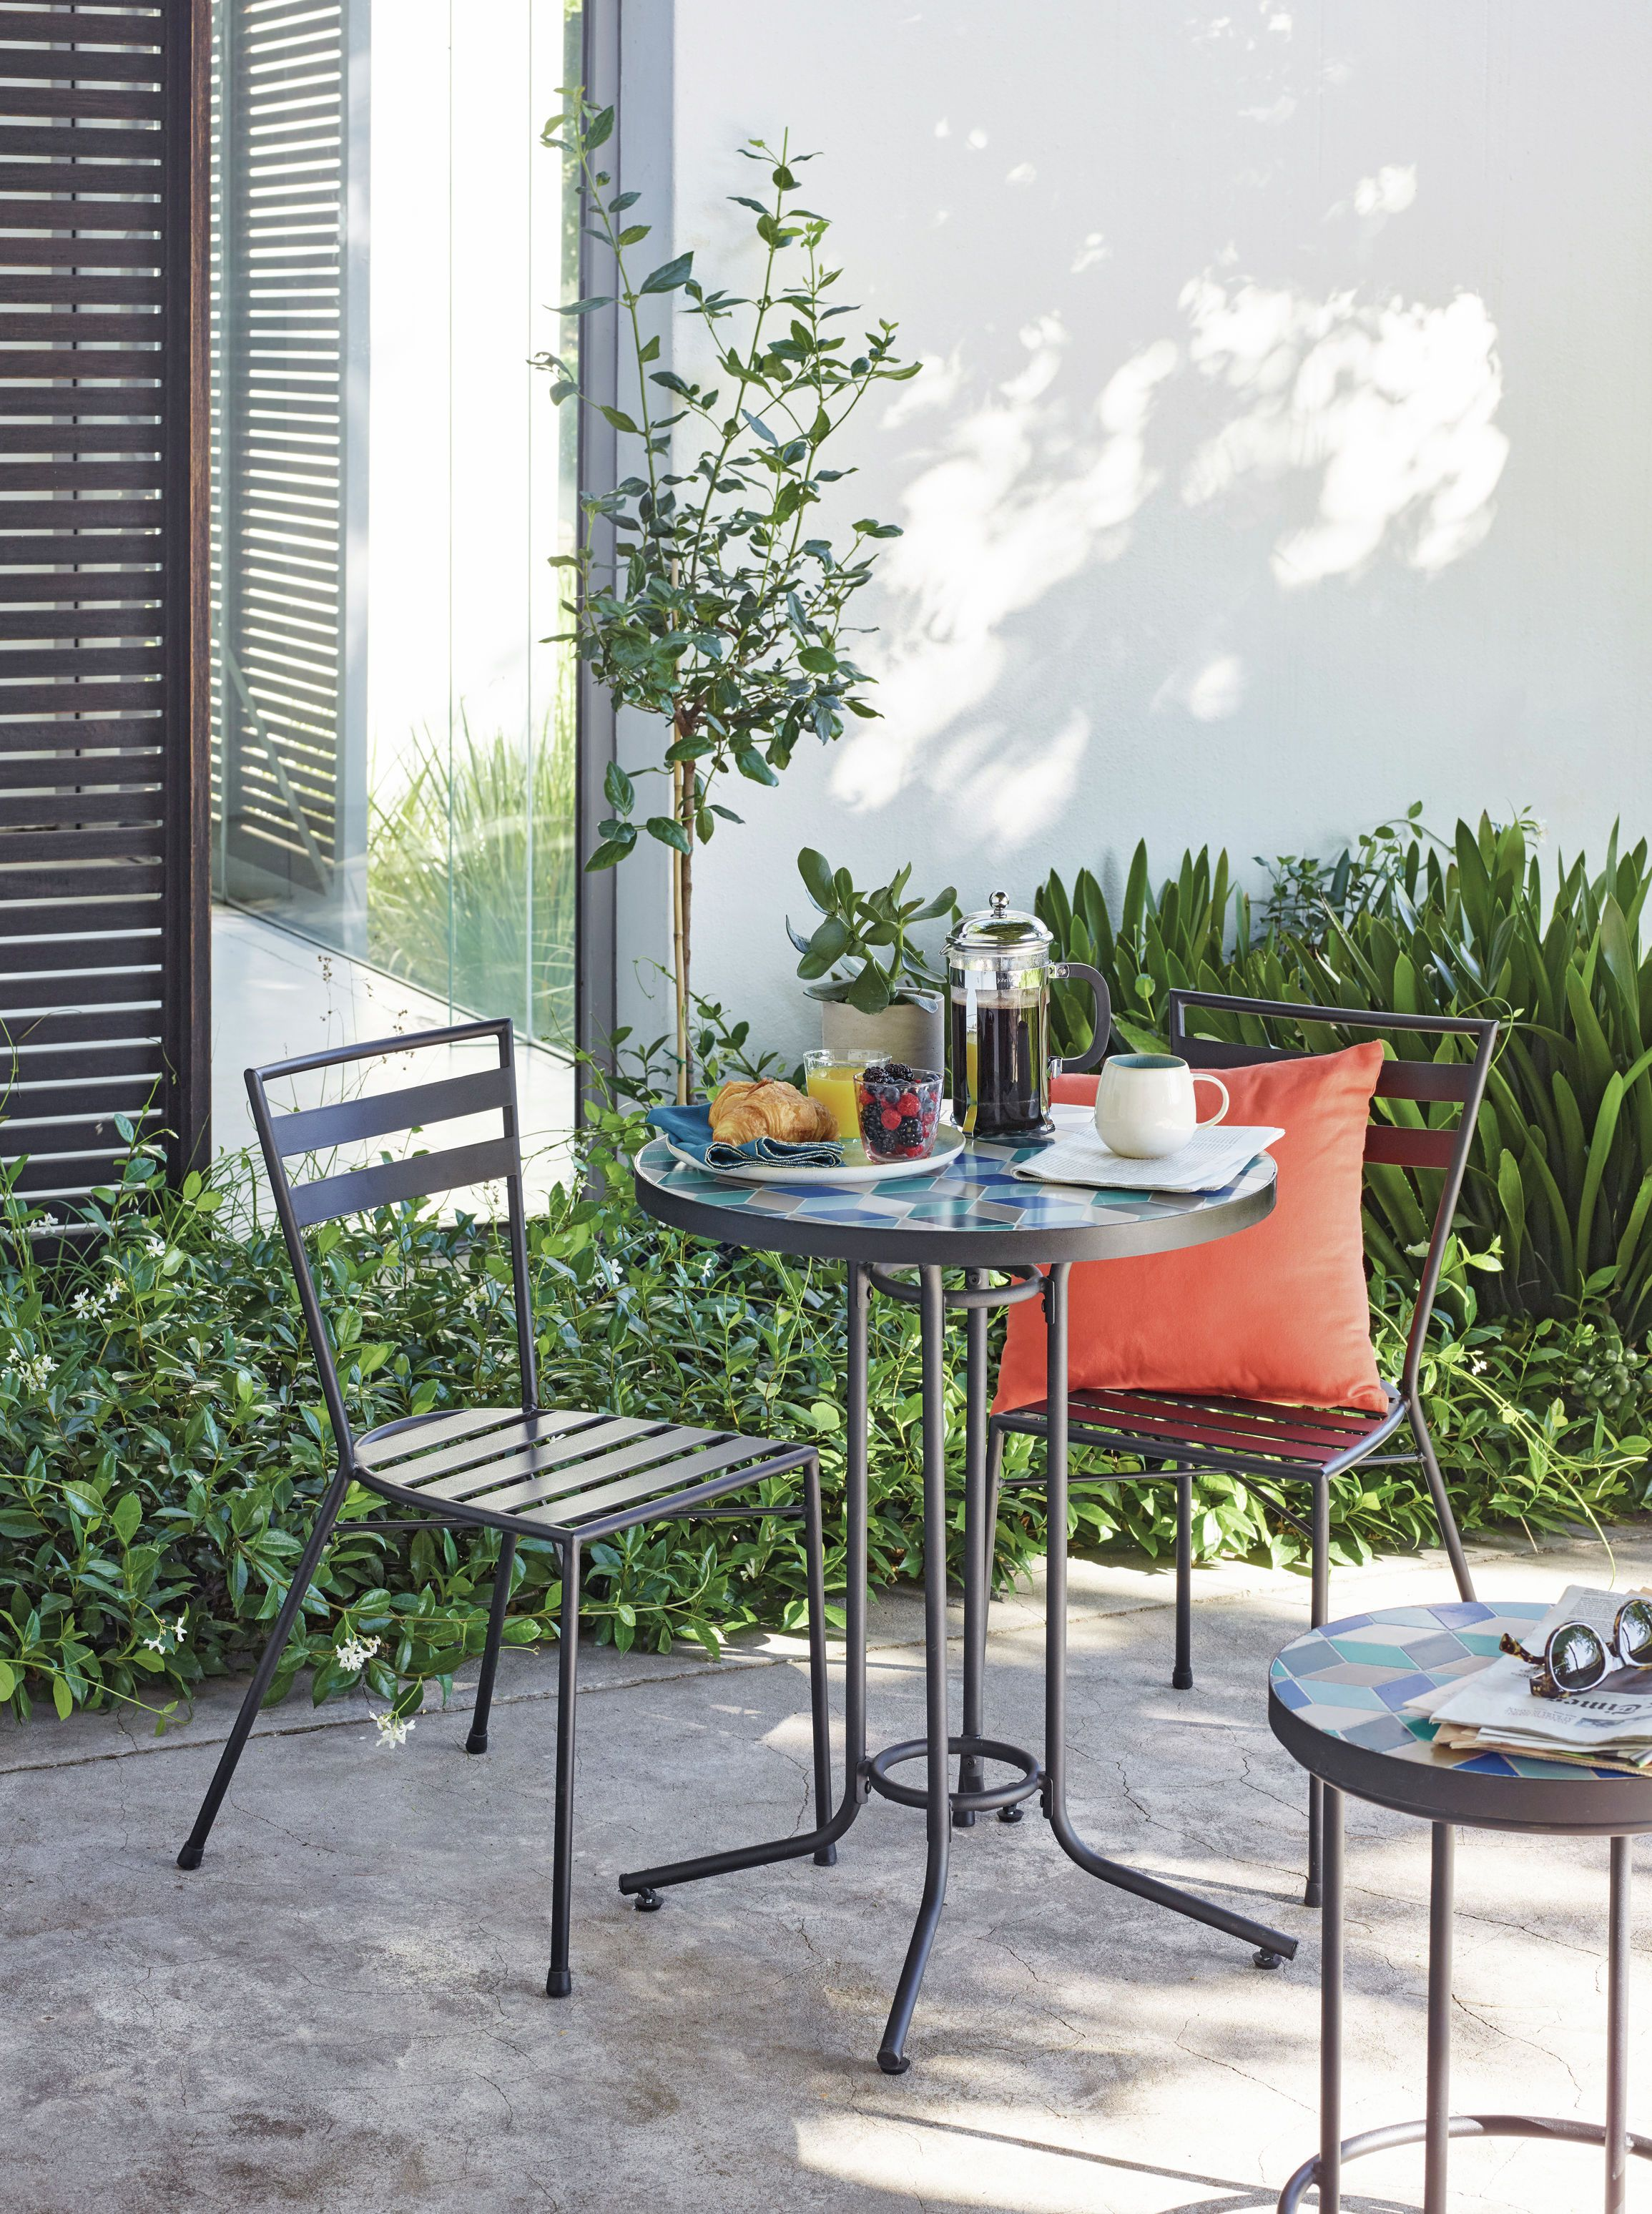 John Lewis Suri 2 Seater Mosaic Bistro Garden Table and Chairs Set, Multi